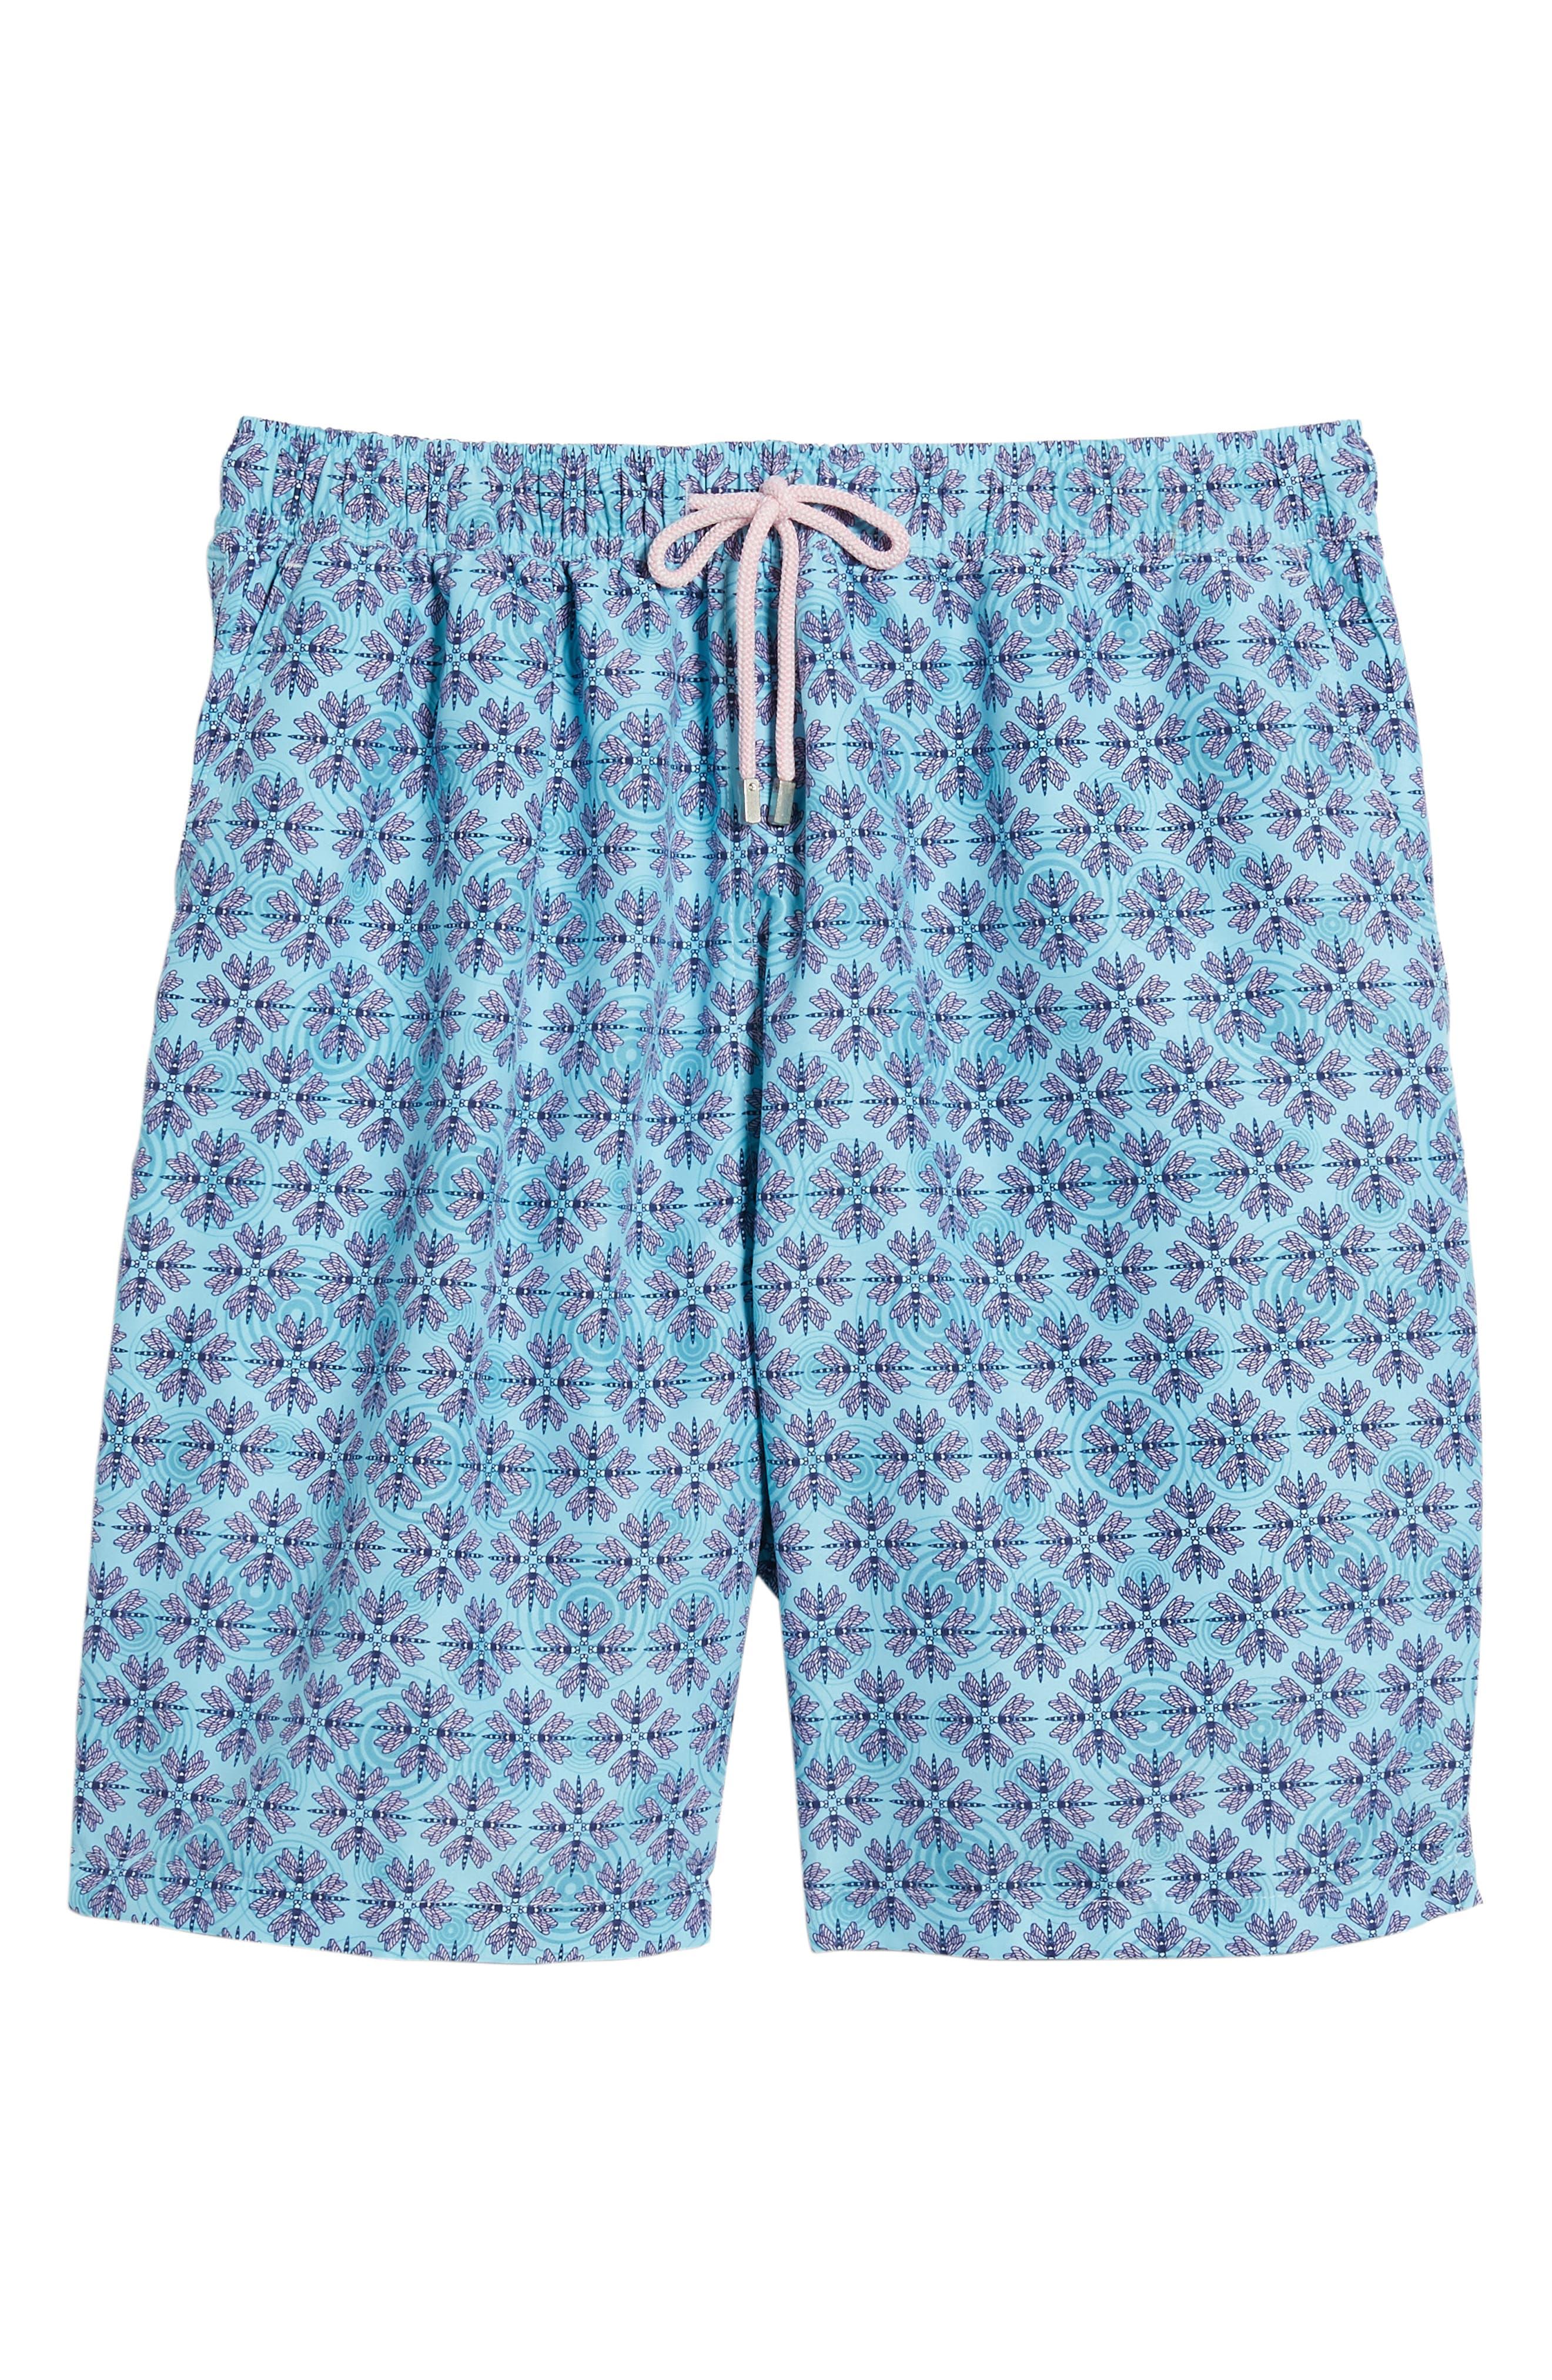 Dragonflies Swim Shorts,                             Alternate thumbnail 6, color,                             Watercress